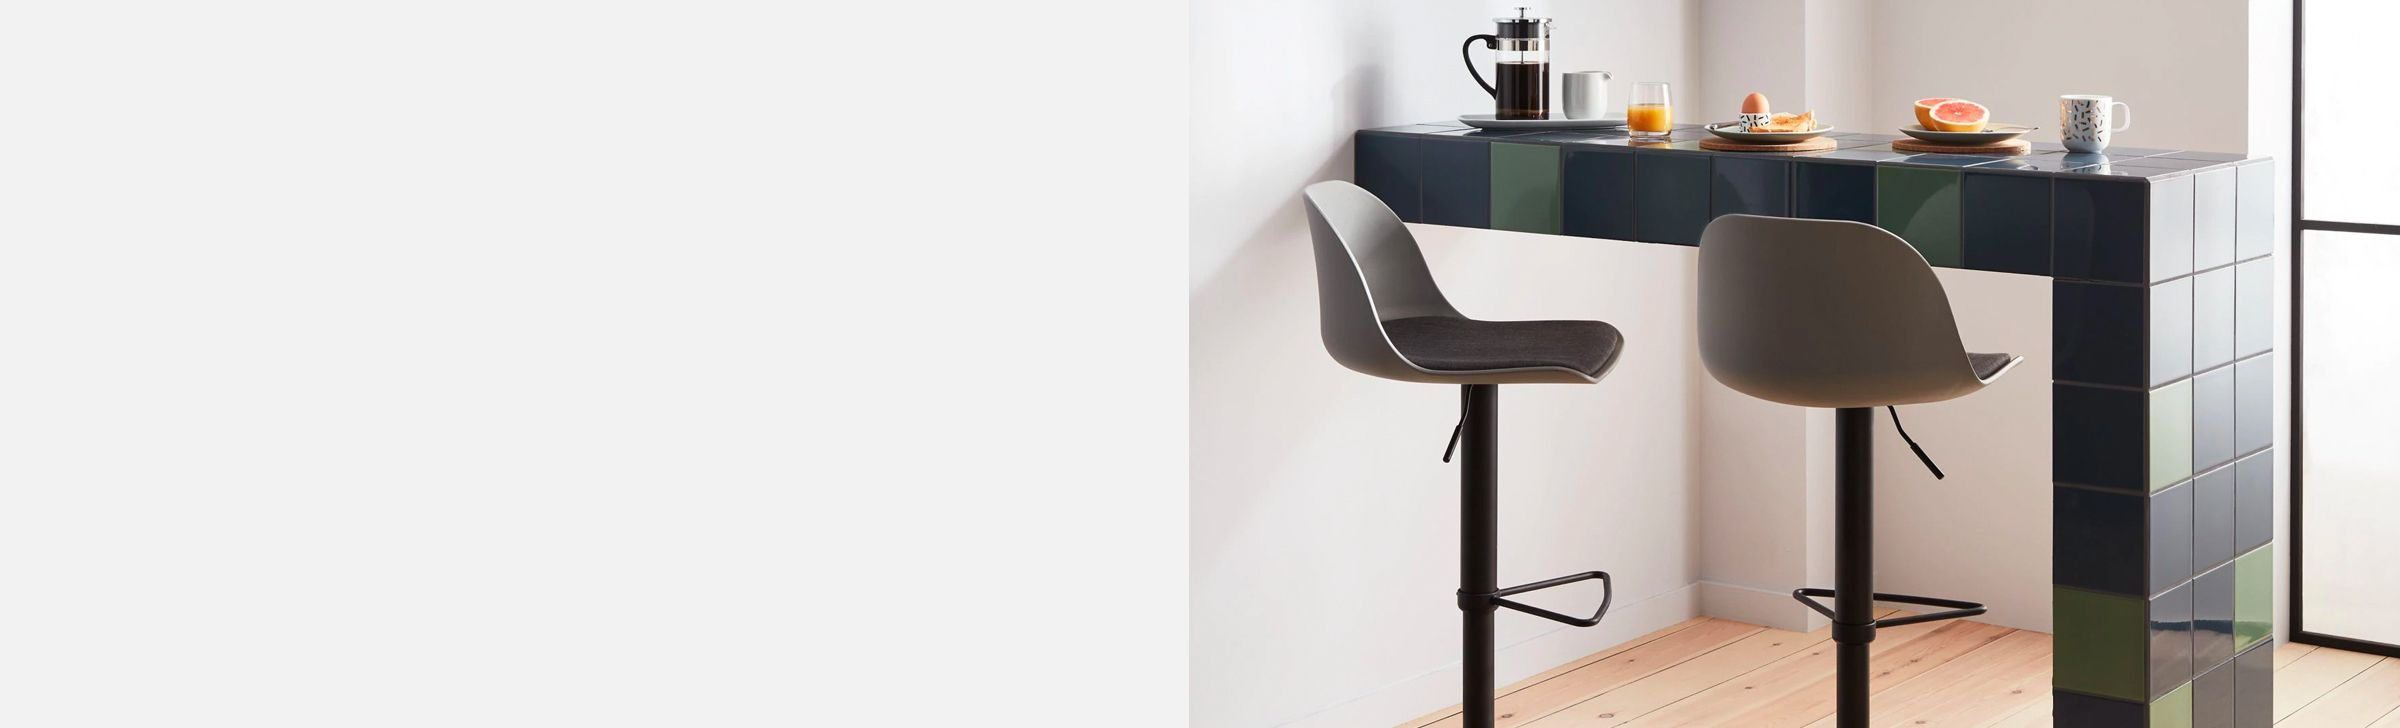 Bar Chairs & Stools   John Lewis & Partners